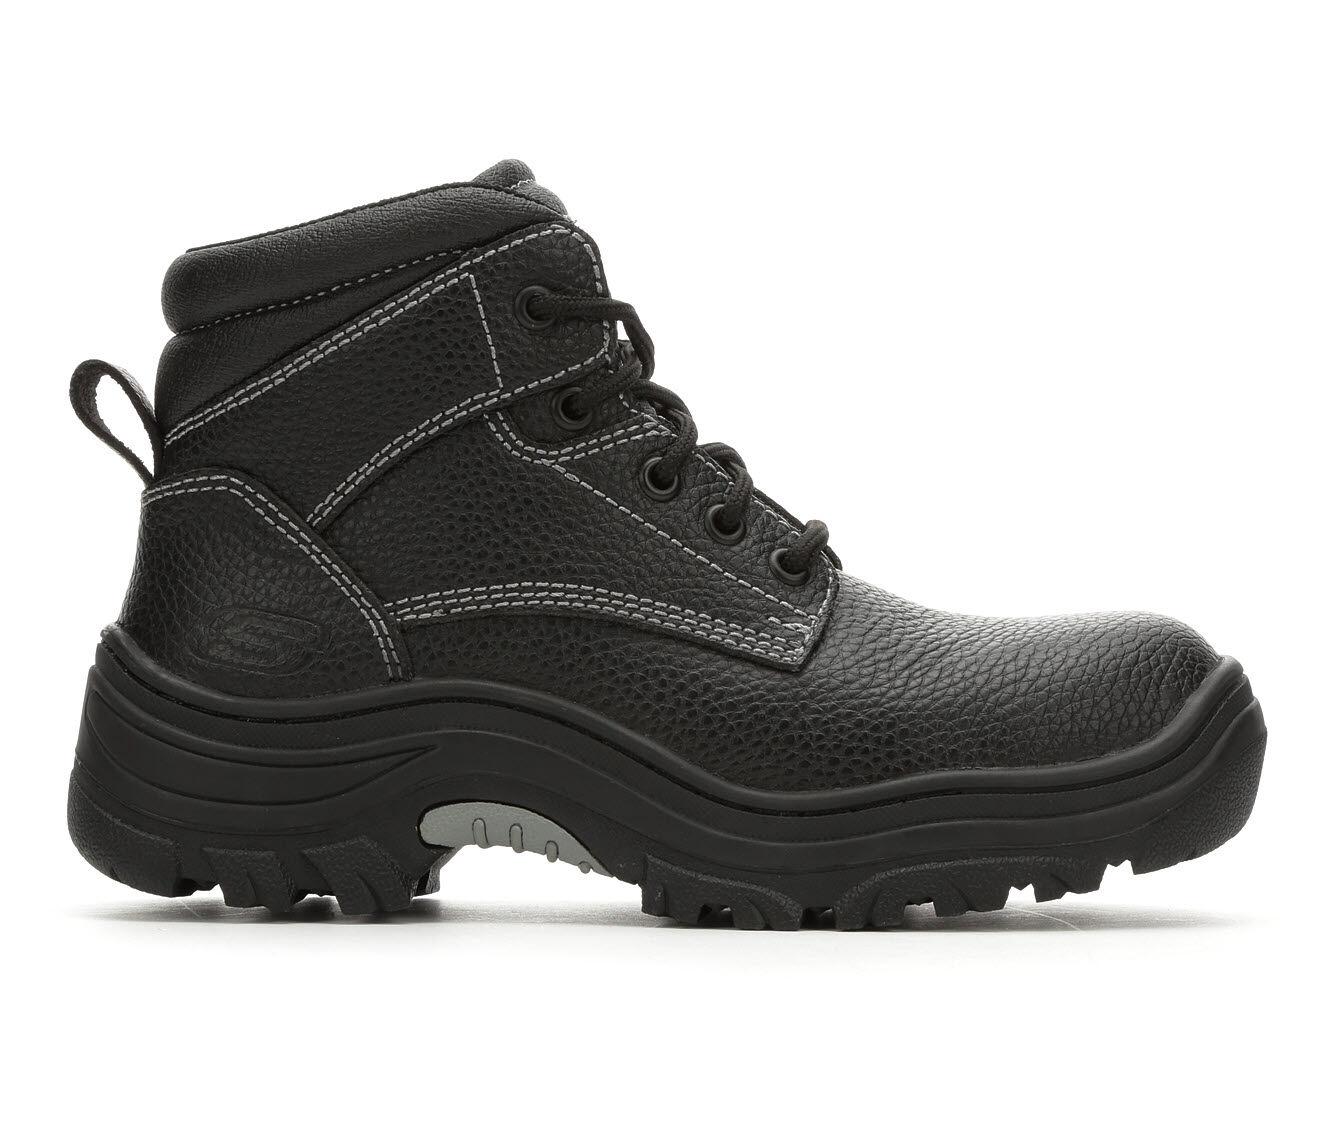 Women's Skechers Work Workshire Krabok 77241 Steel Toe Work Boots Black